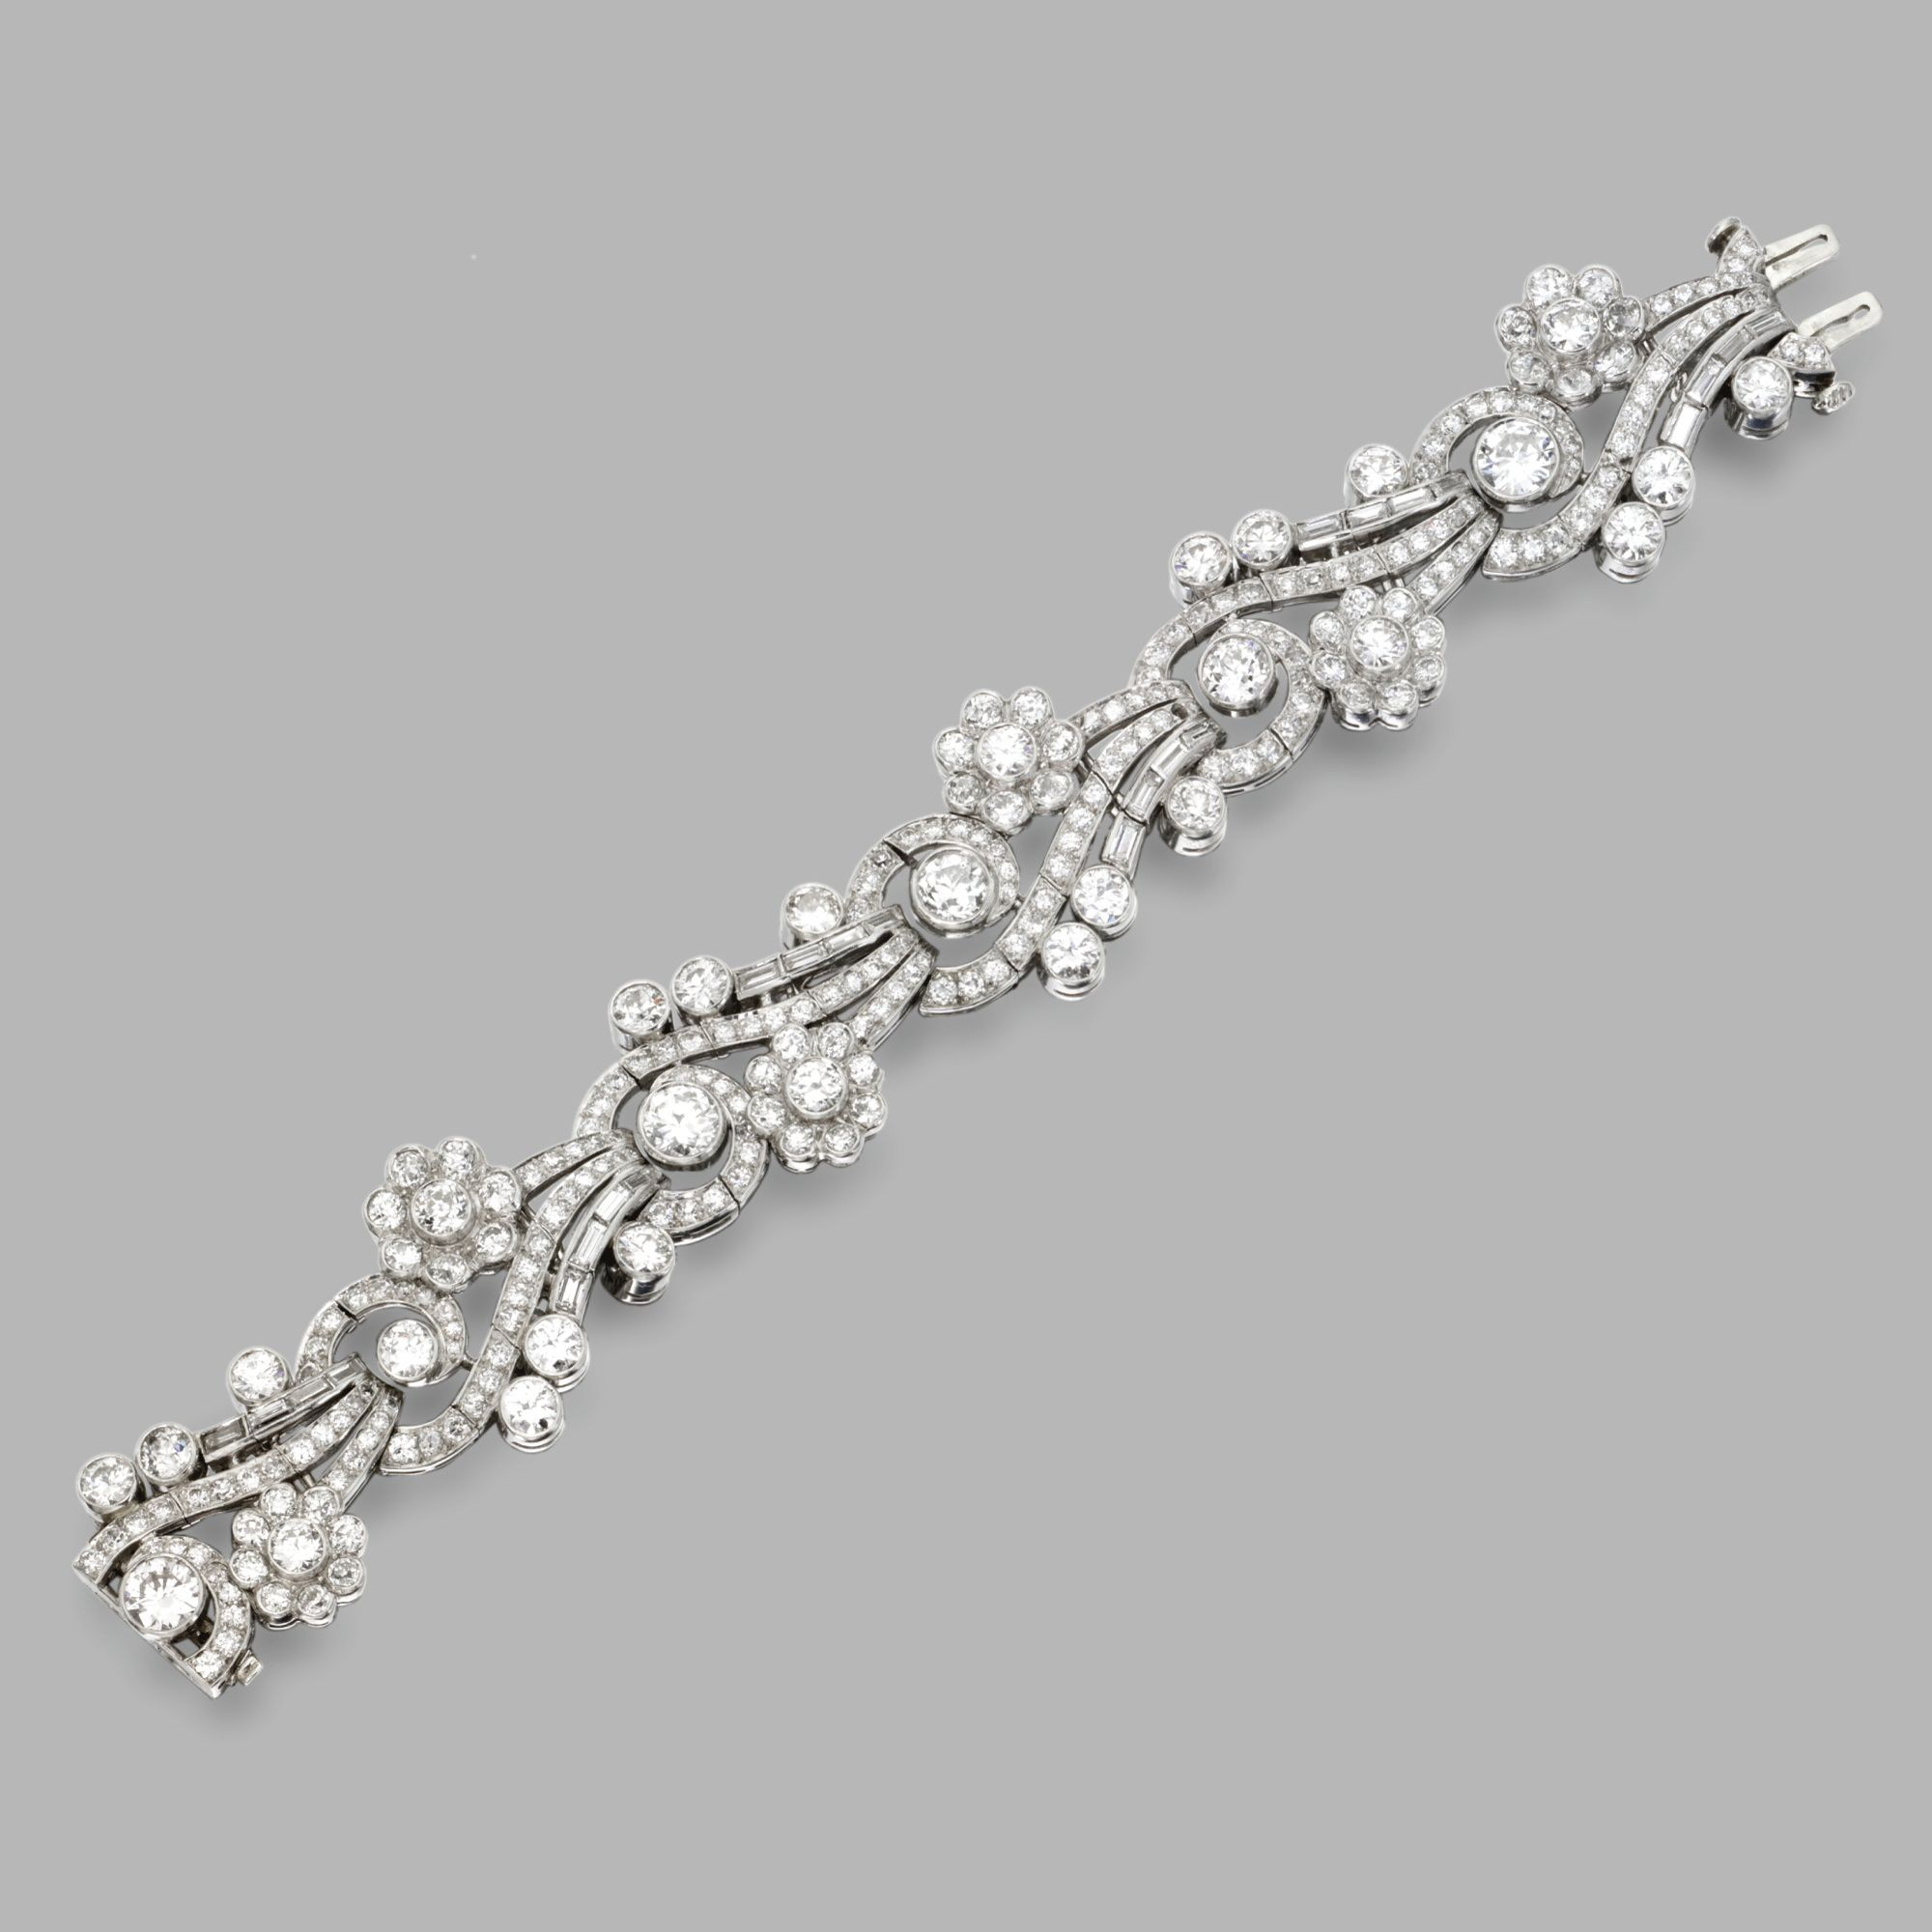 Platinum and diamond bracelet lot sothebyus wedding